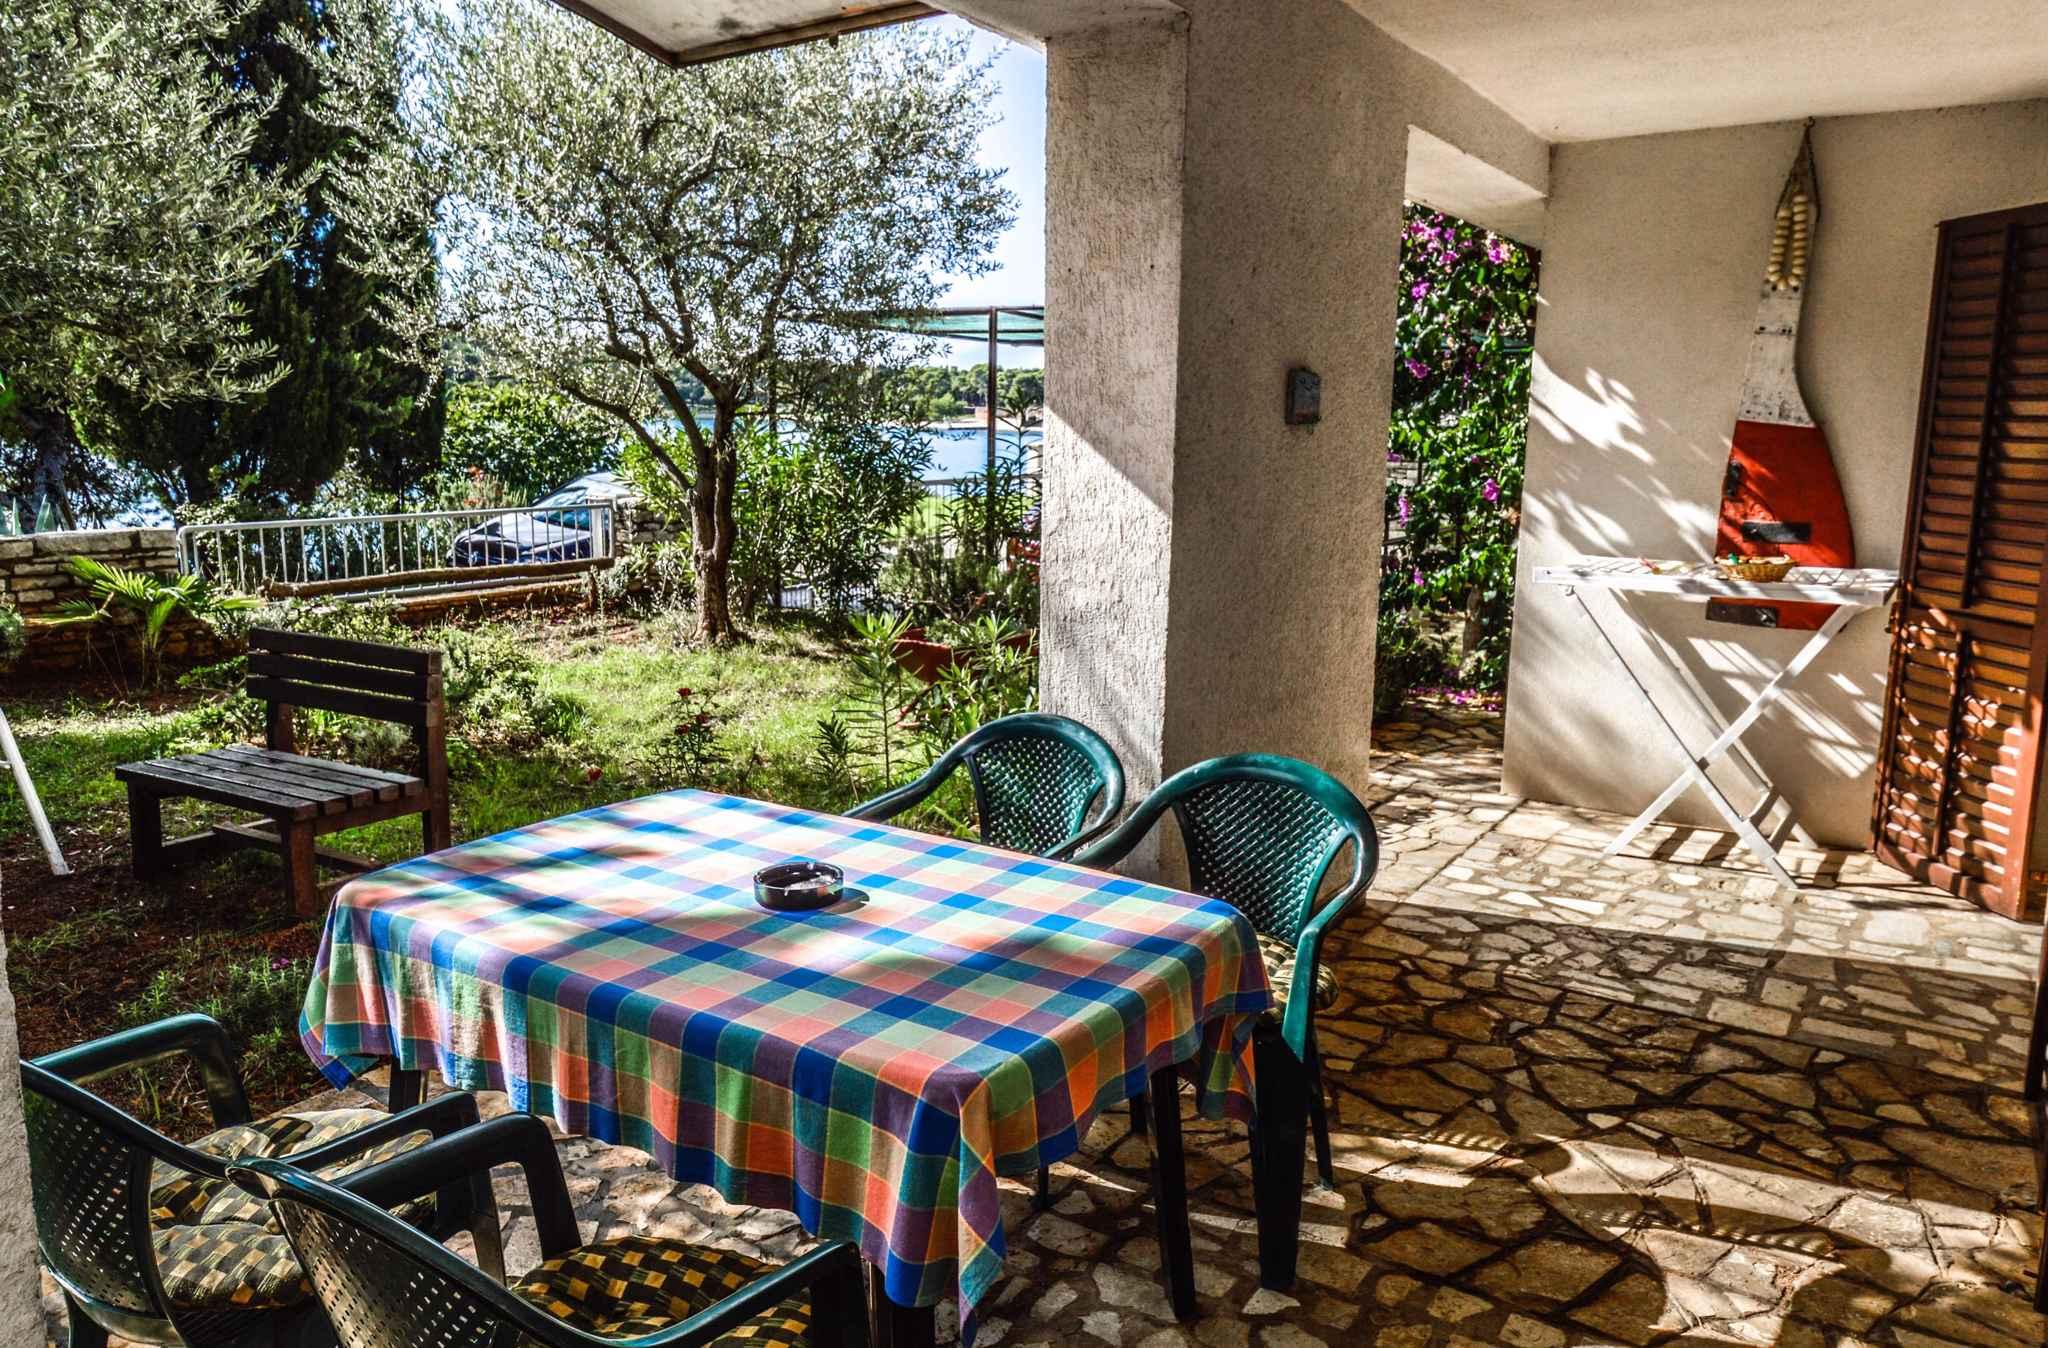 Ferienwohnung direkt am Meer gelegen (280674), Pula, , Istrien, Kroatien, Bild 7